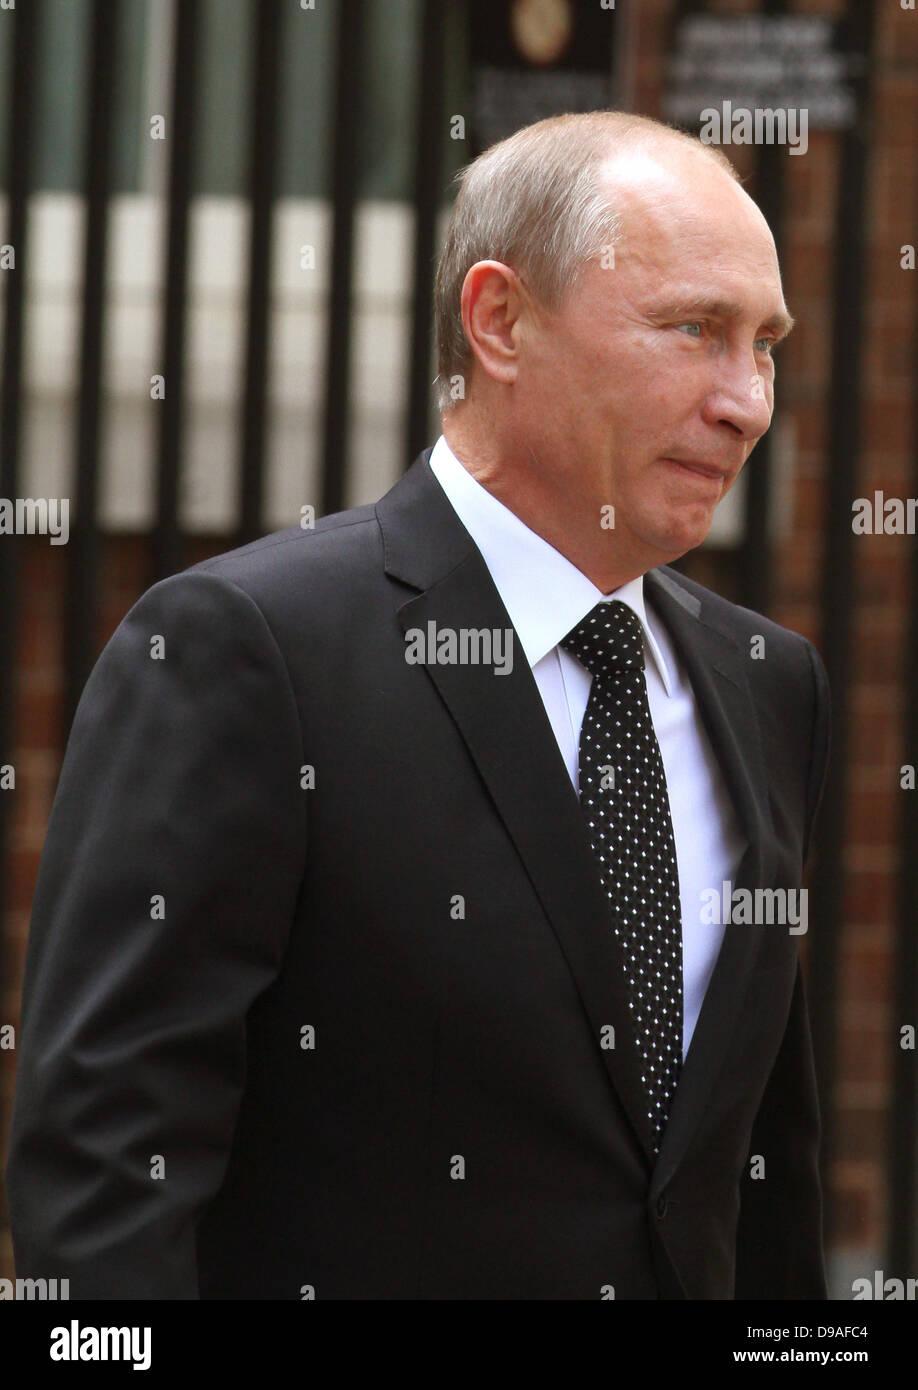 VLADIMIR PUTIN RUSSIAN PRESIDENT 16 June 2013 10 DOWNING STREET  LONDON ENGLAND - Stock Image